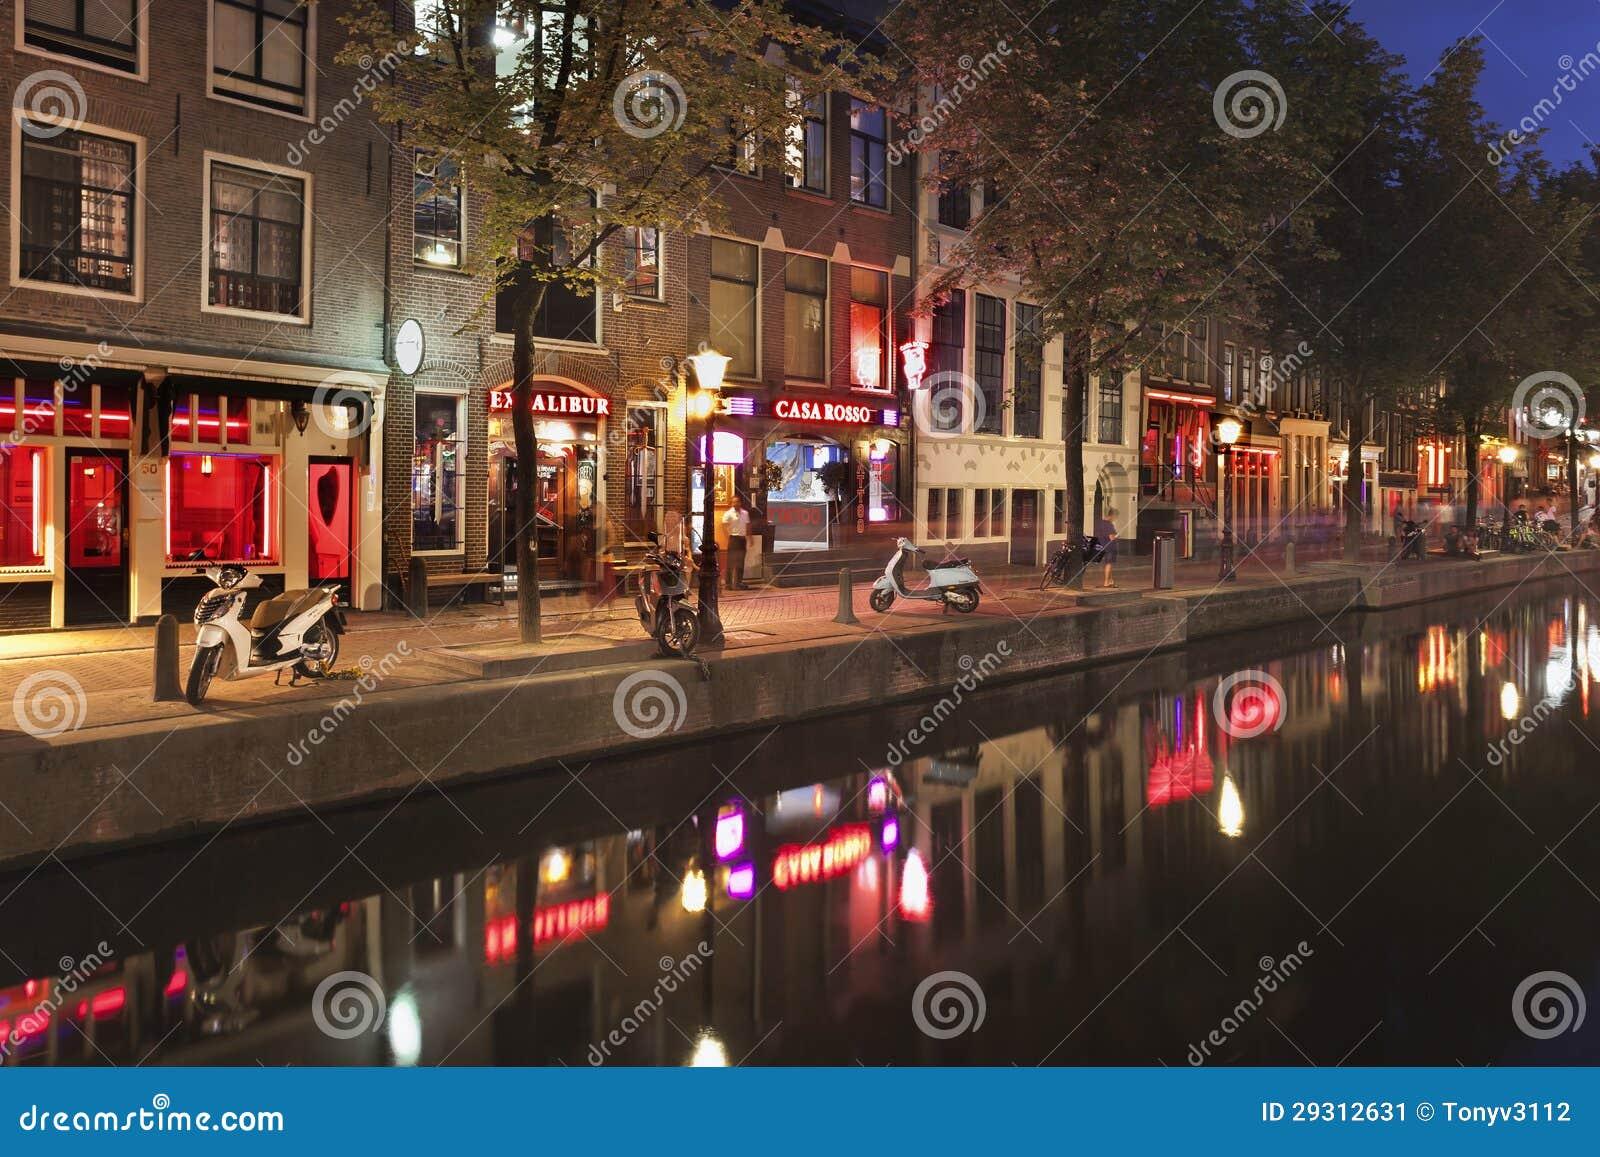 amsterdam redlight street